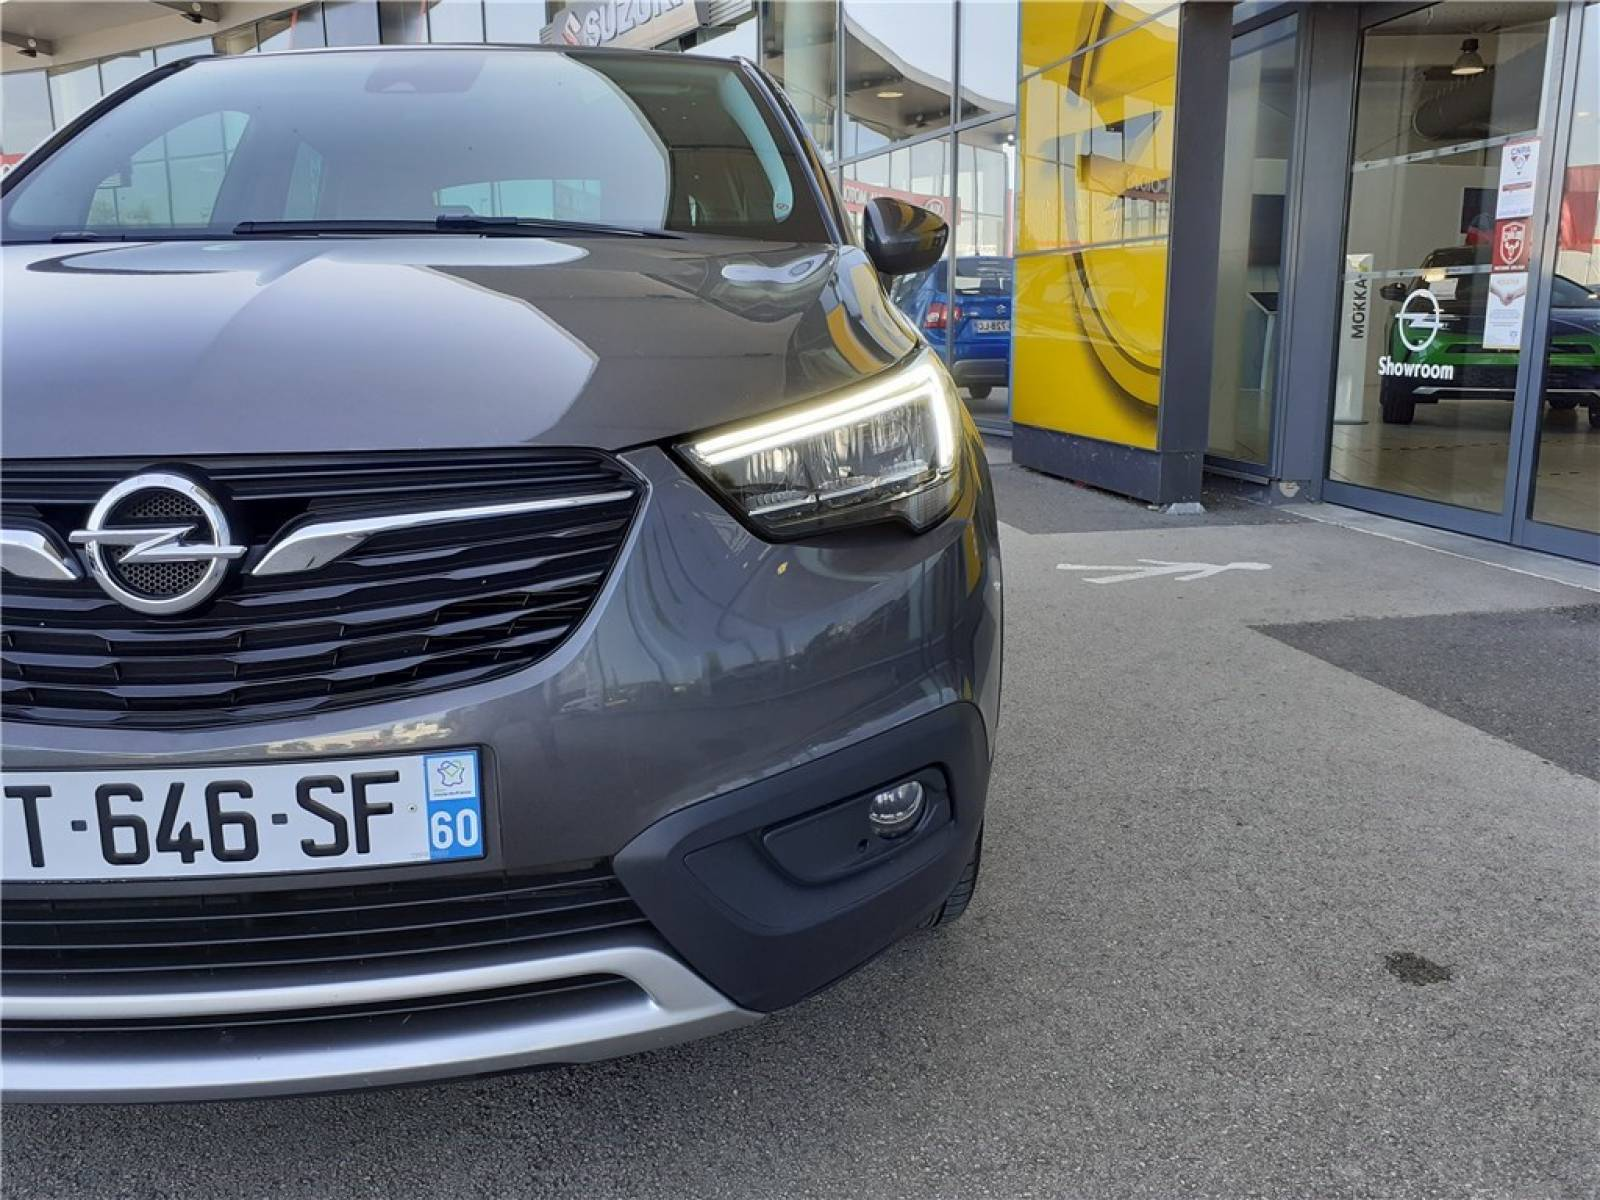 OPEL Crossland X 1.2 Turbo 110 ch - véhicule d'occasion - Groupe Guillet - Opel Magicauto - Chalon-sur-Saône - 71380 - Saint-Marcel - 3